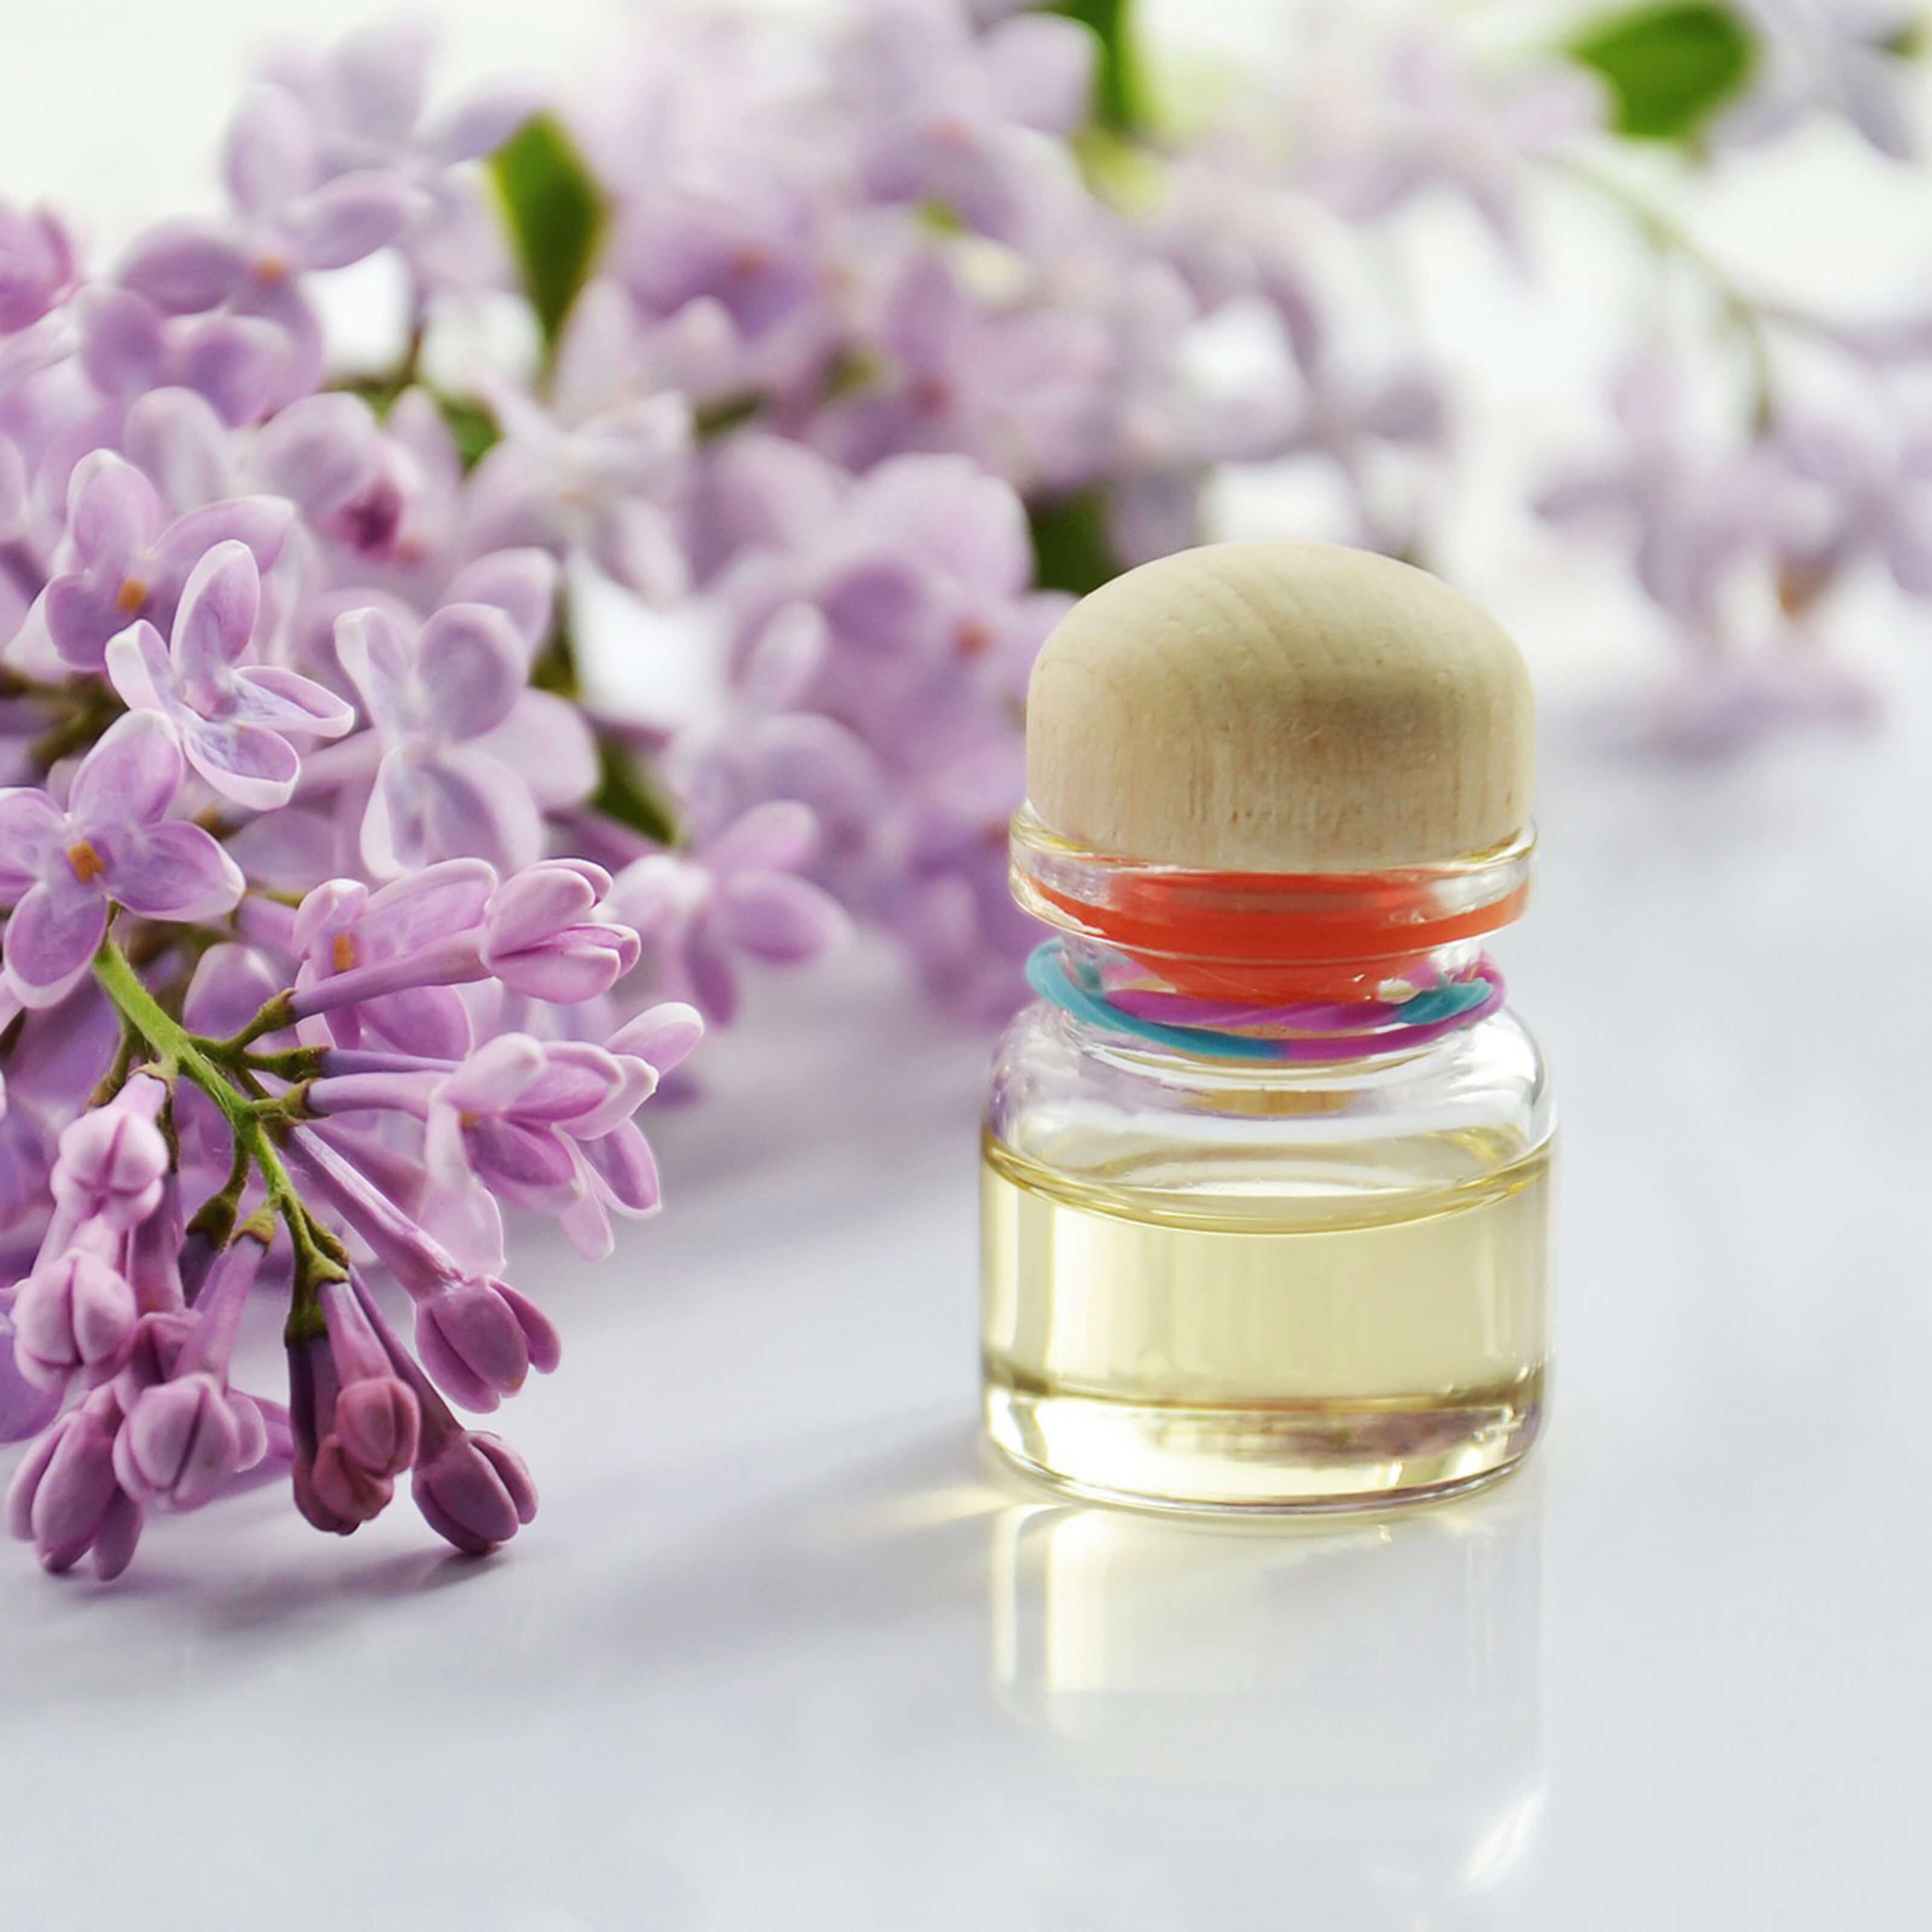 perfume bottle, flowers